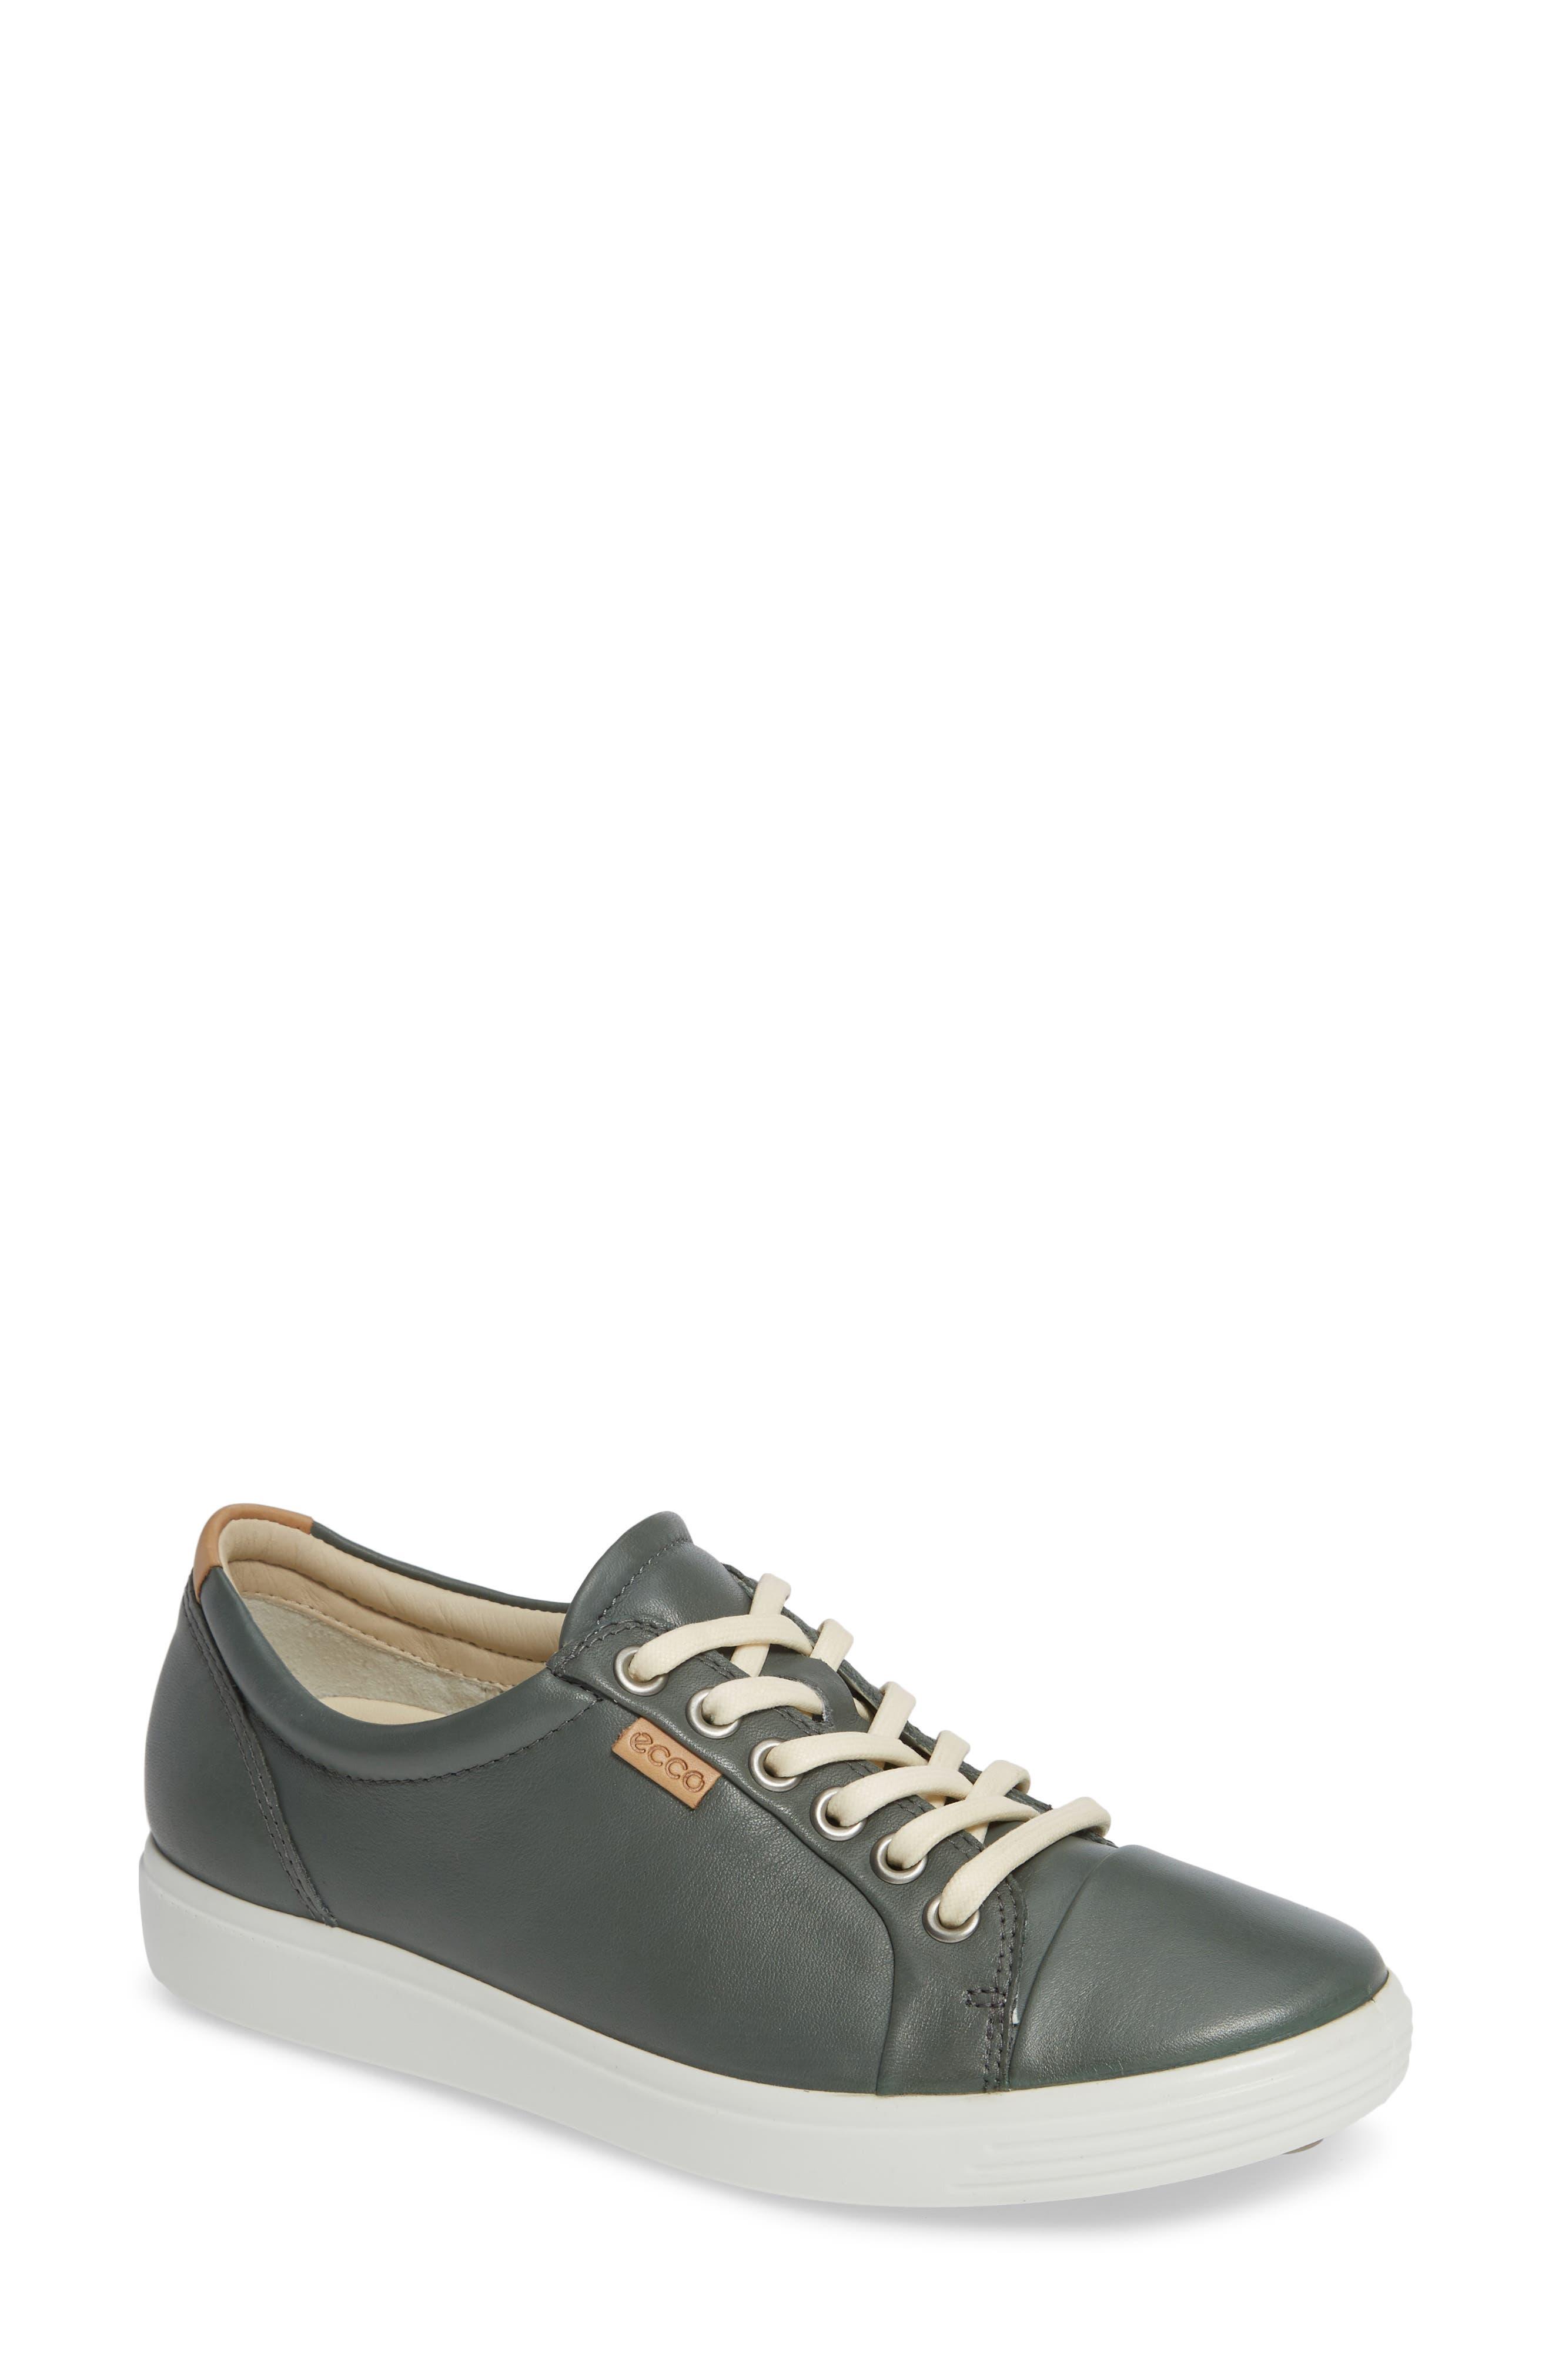 ,                             Soft 7 Sneaker,                             Main thumbnail 37, color,                             020